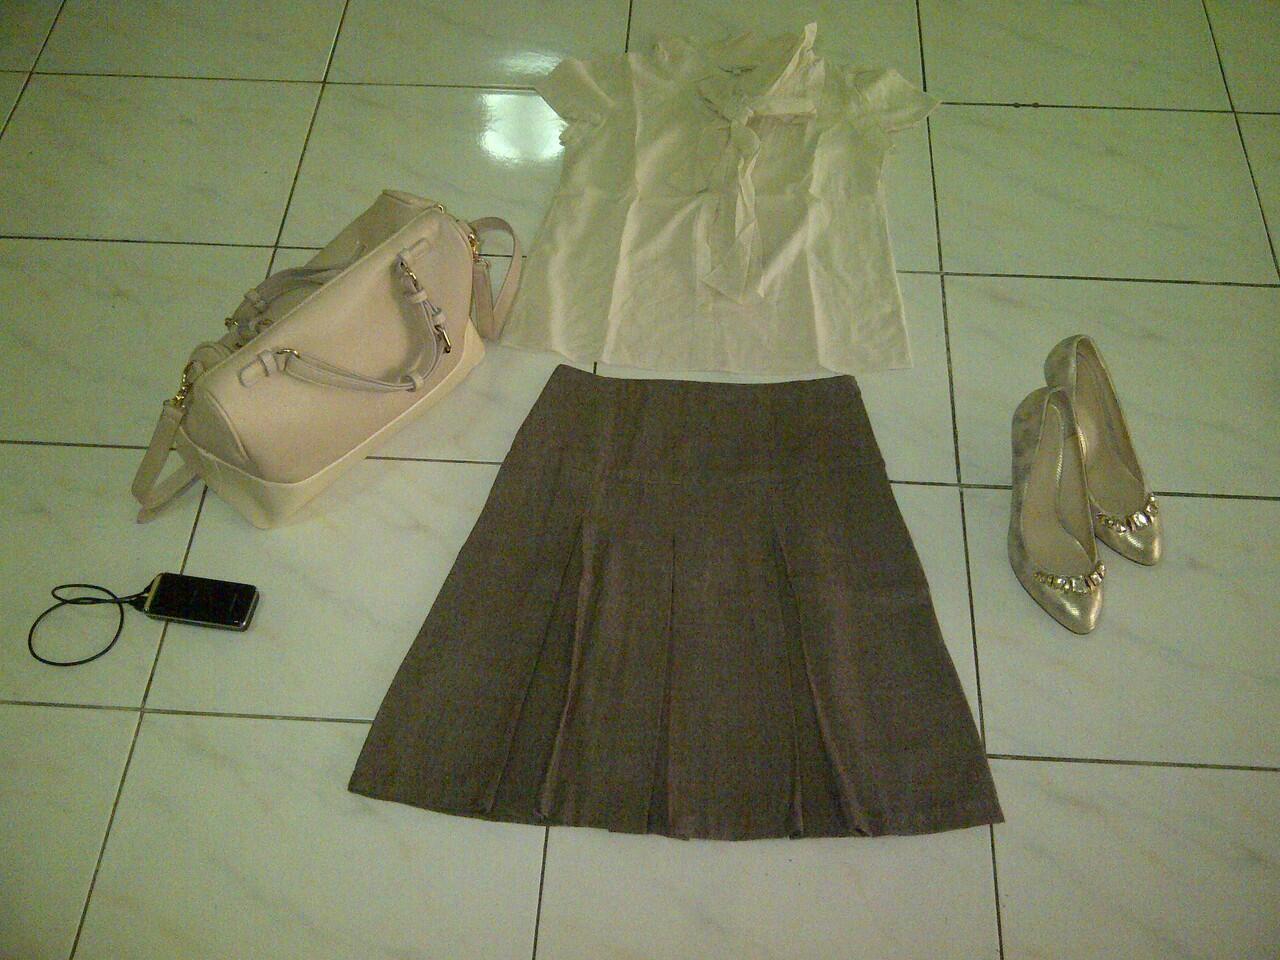 sale bongkar lemari kemeja, blazer, rok mini, dress second harga miring (JILID II)